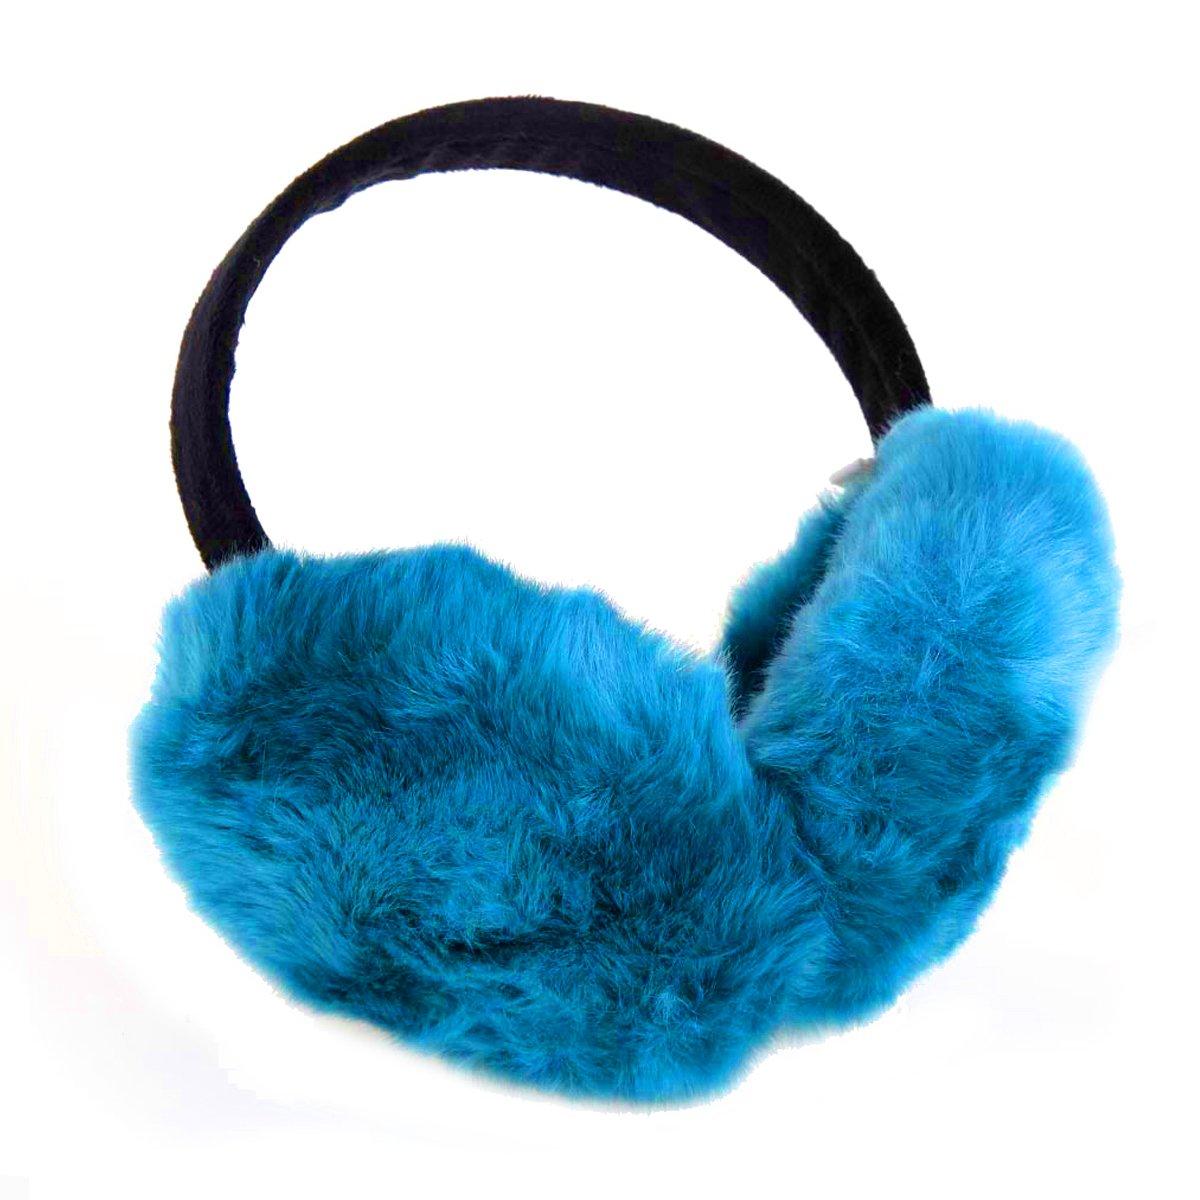 ChikaMika Winter Earmuffs for Women Girls Winter Ear muffs Large Over Ear Foldable EarMuff (Blue)